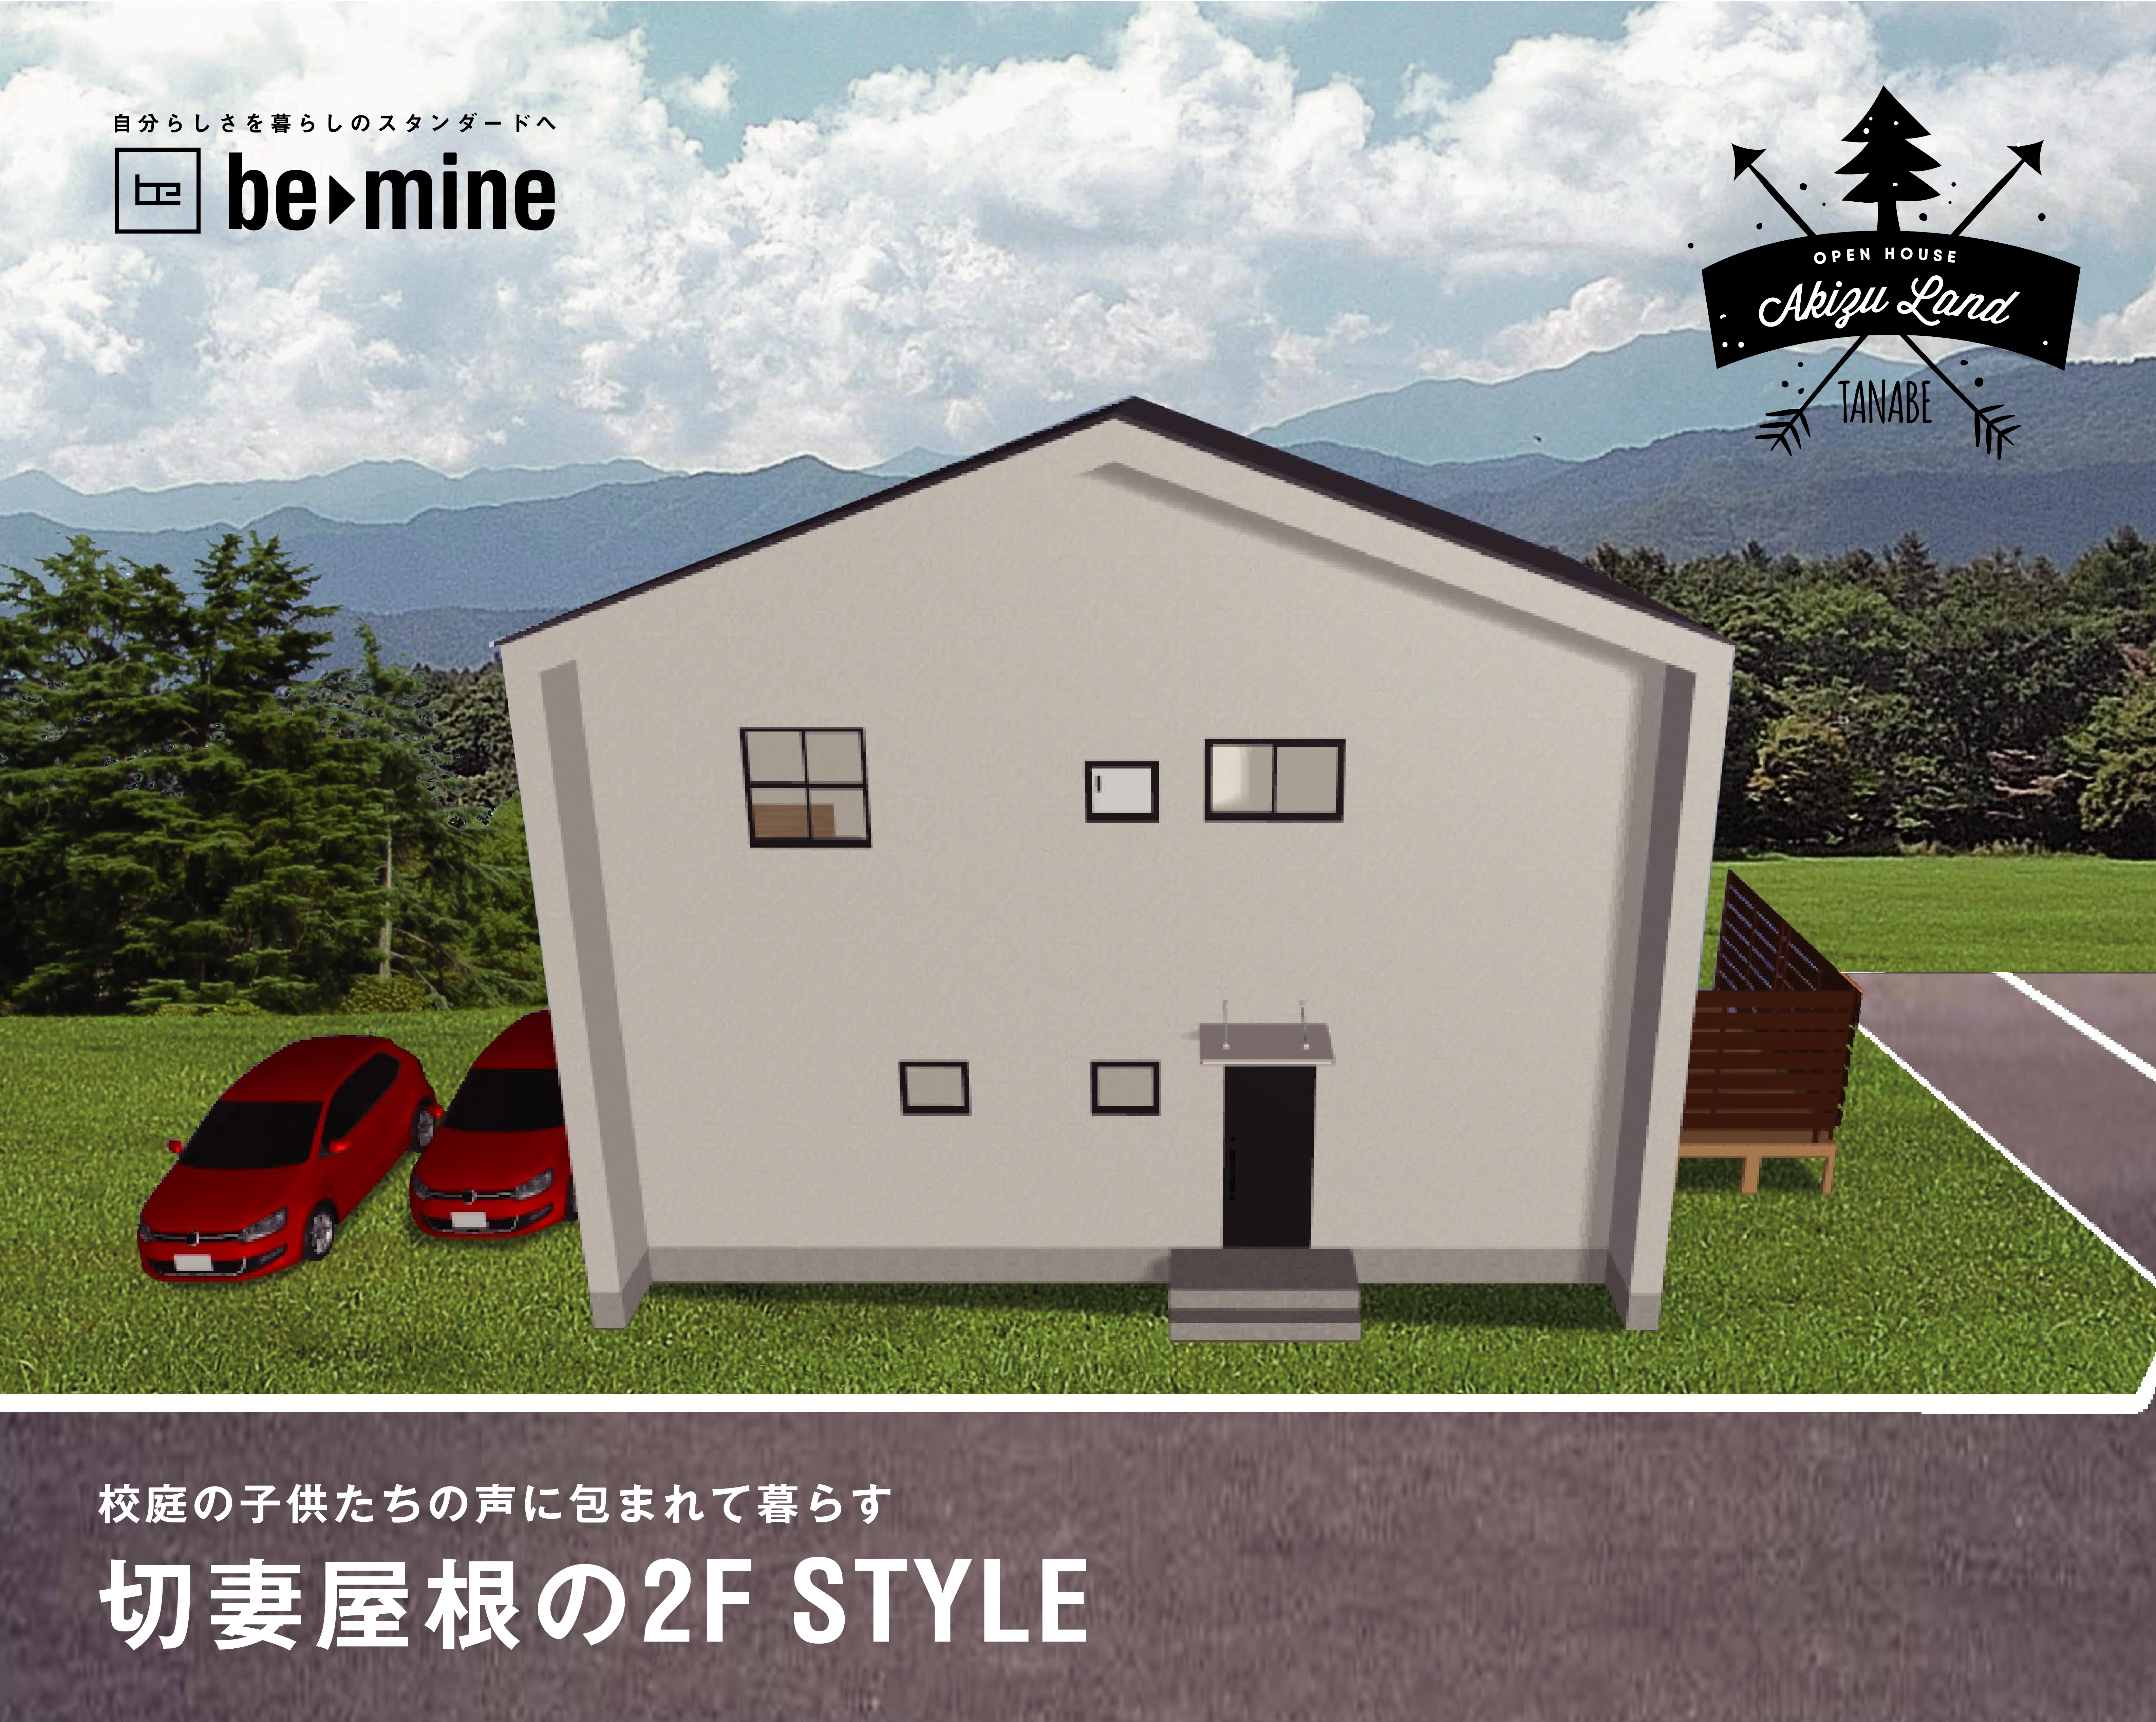 20171209-bemine_000003